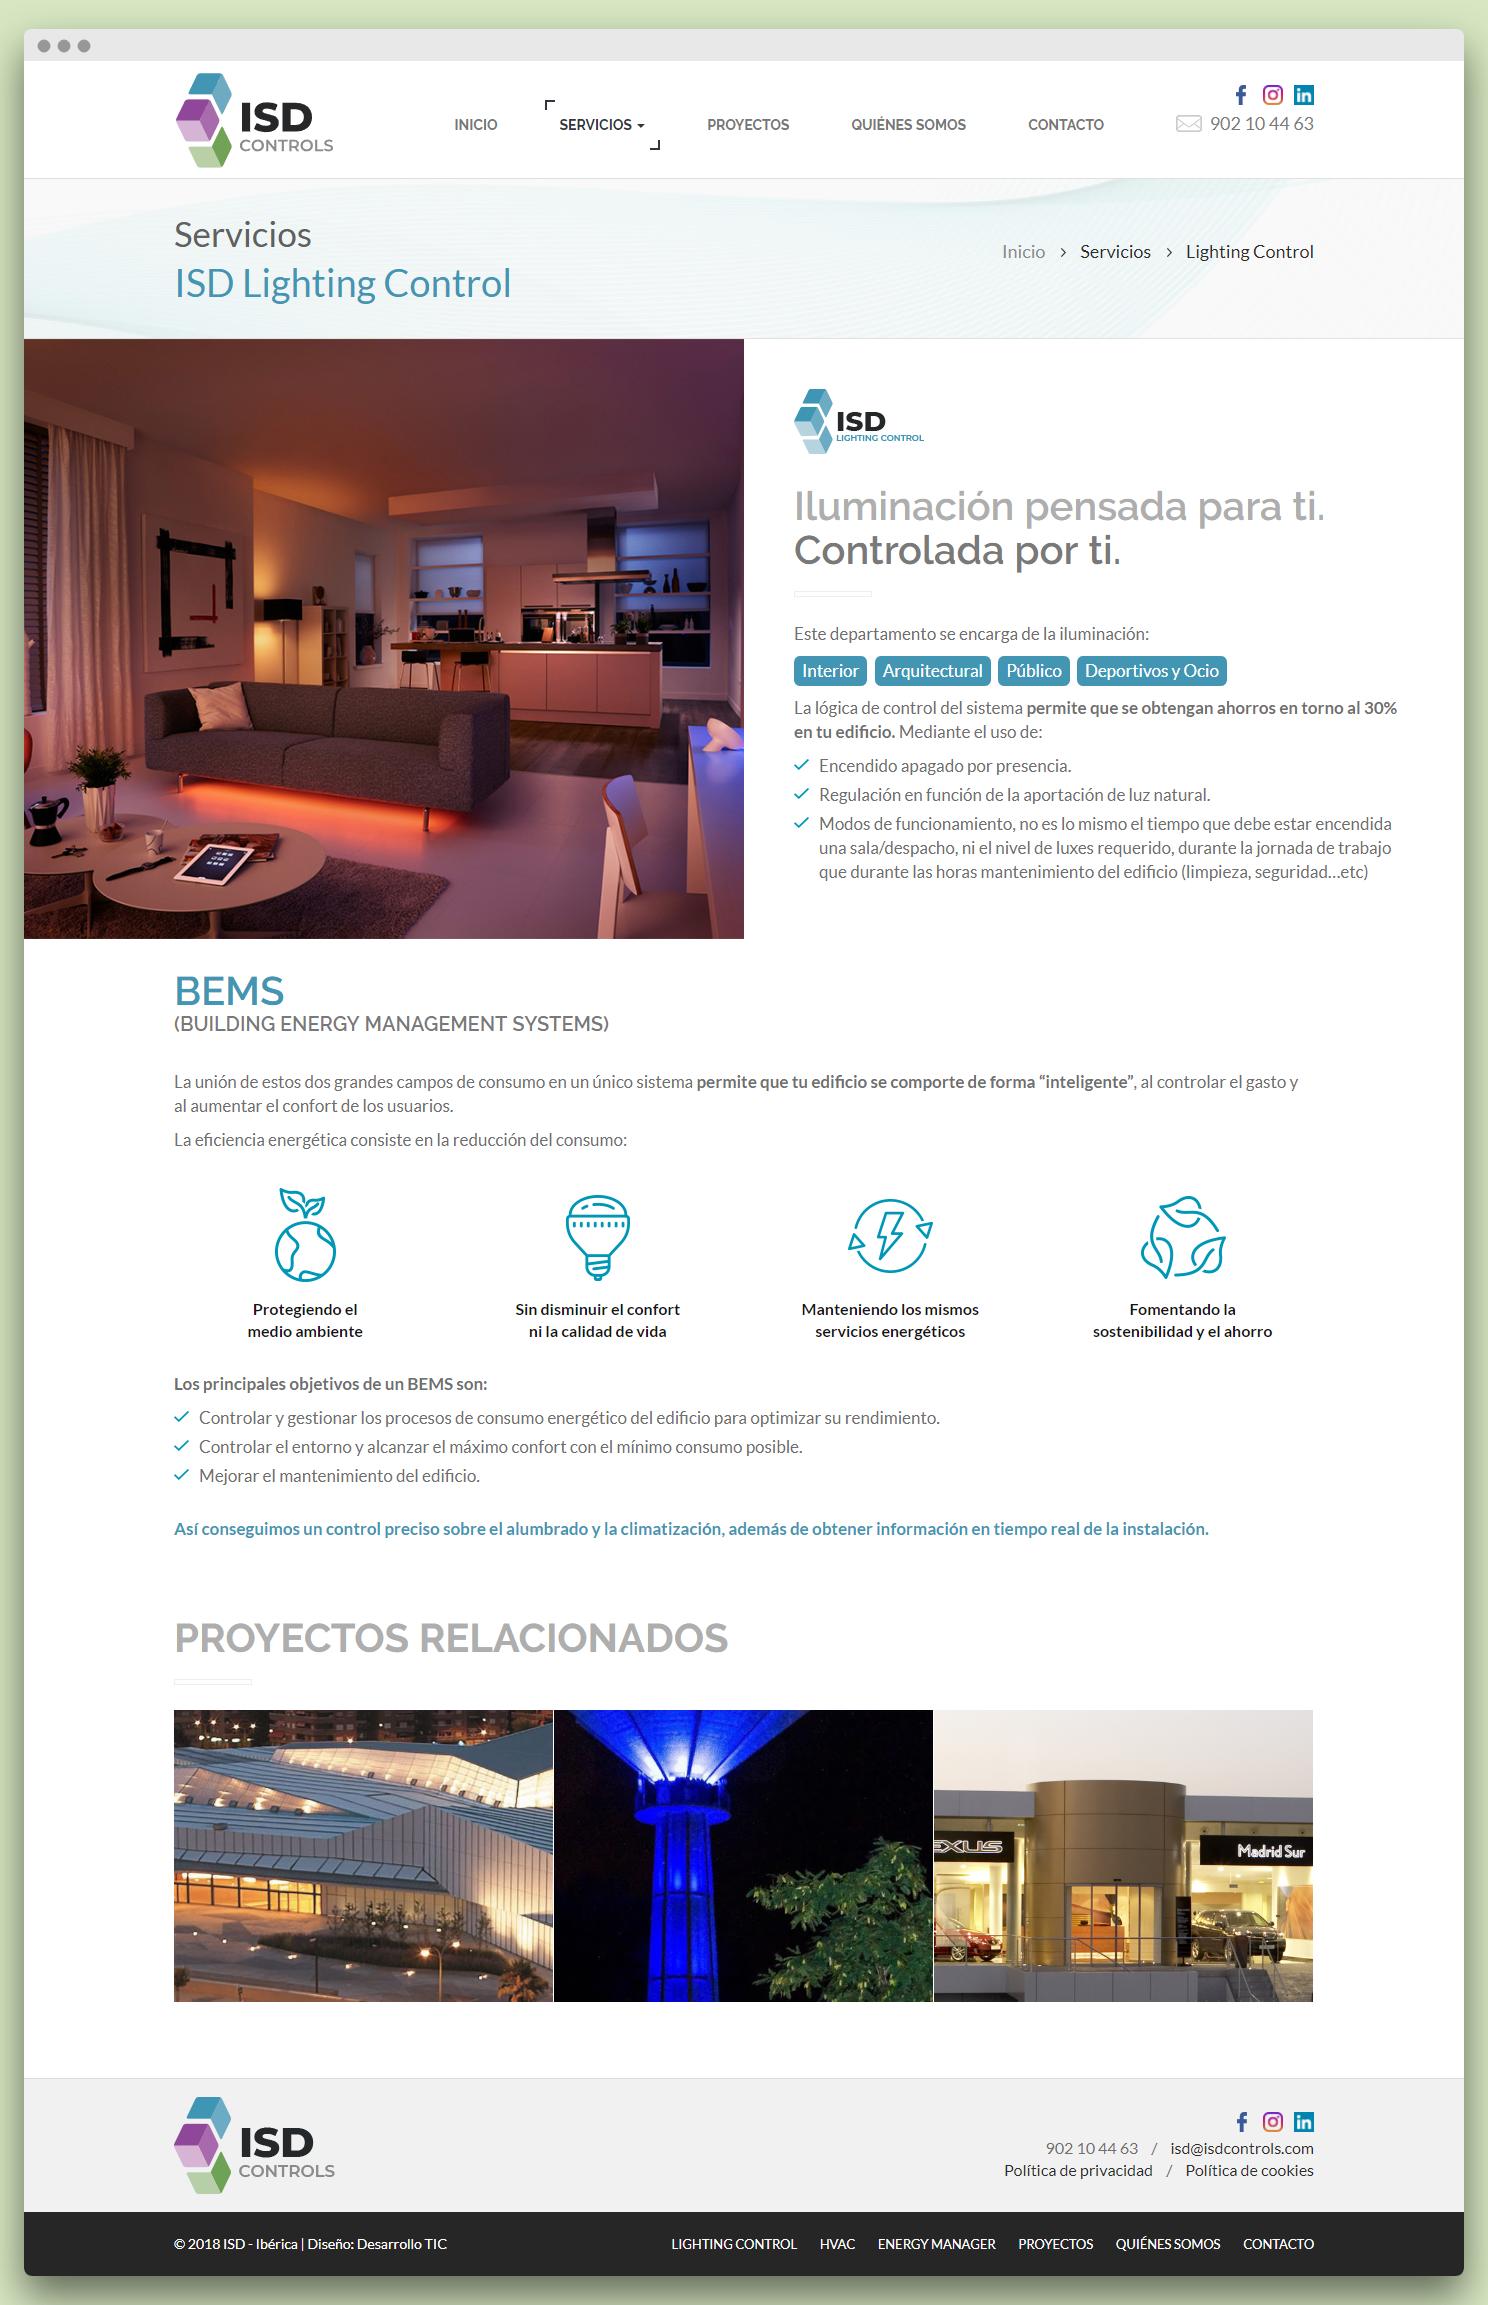 Imagen adicional 2 del proyecto ISD Controls